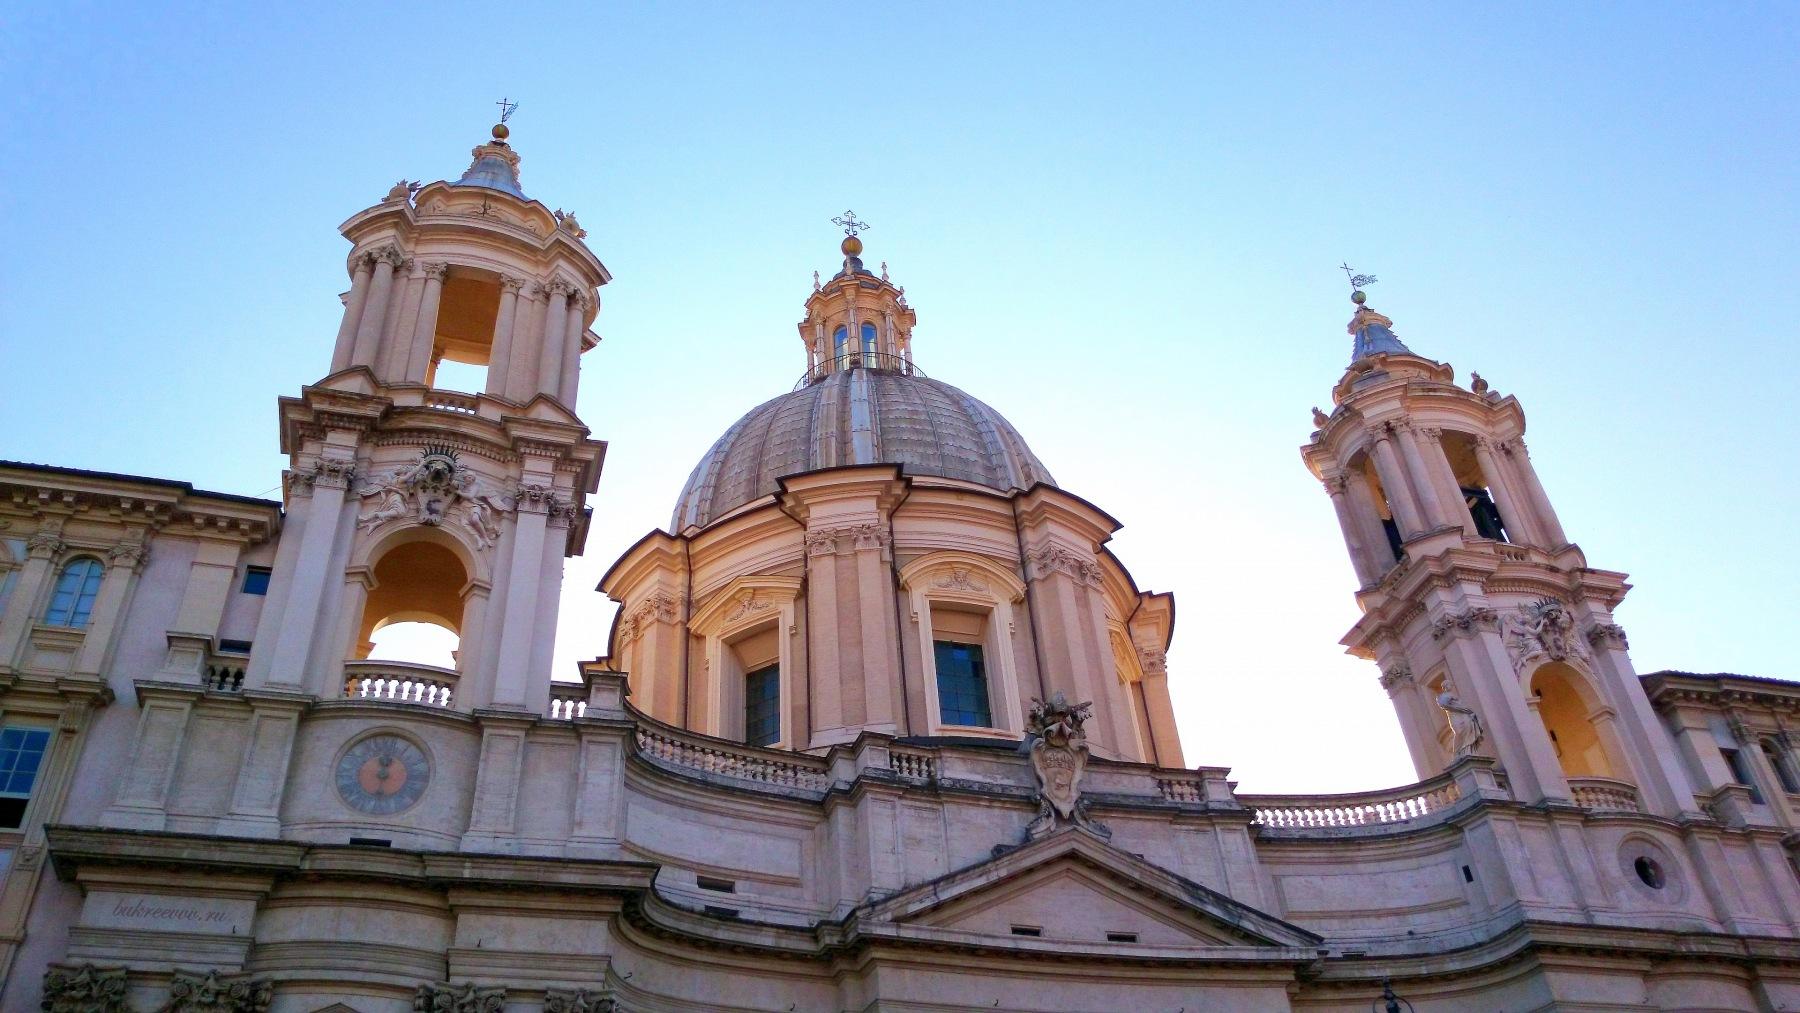 Piazza Navona 69